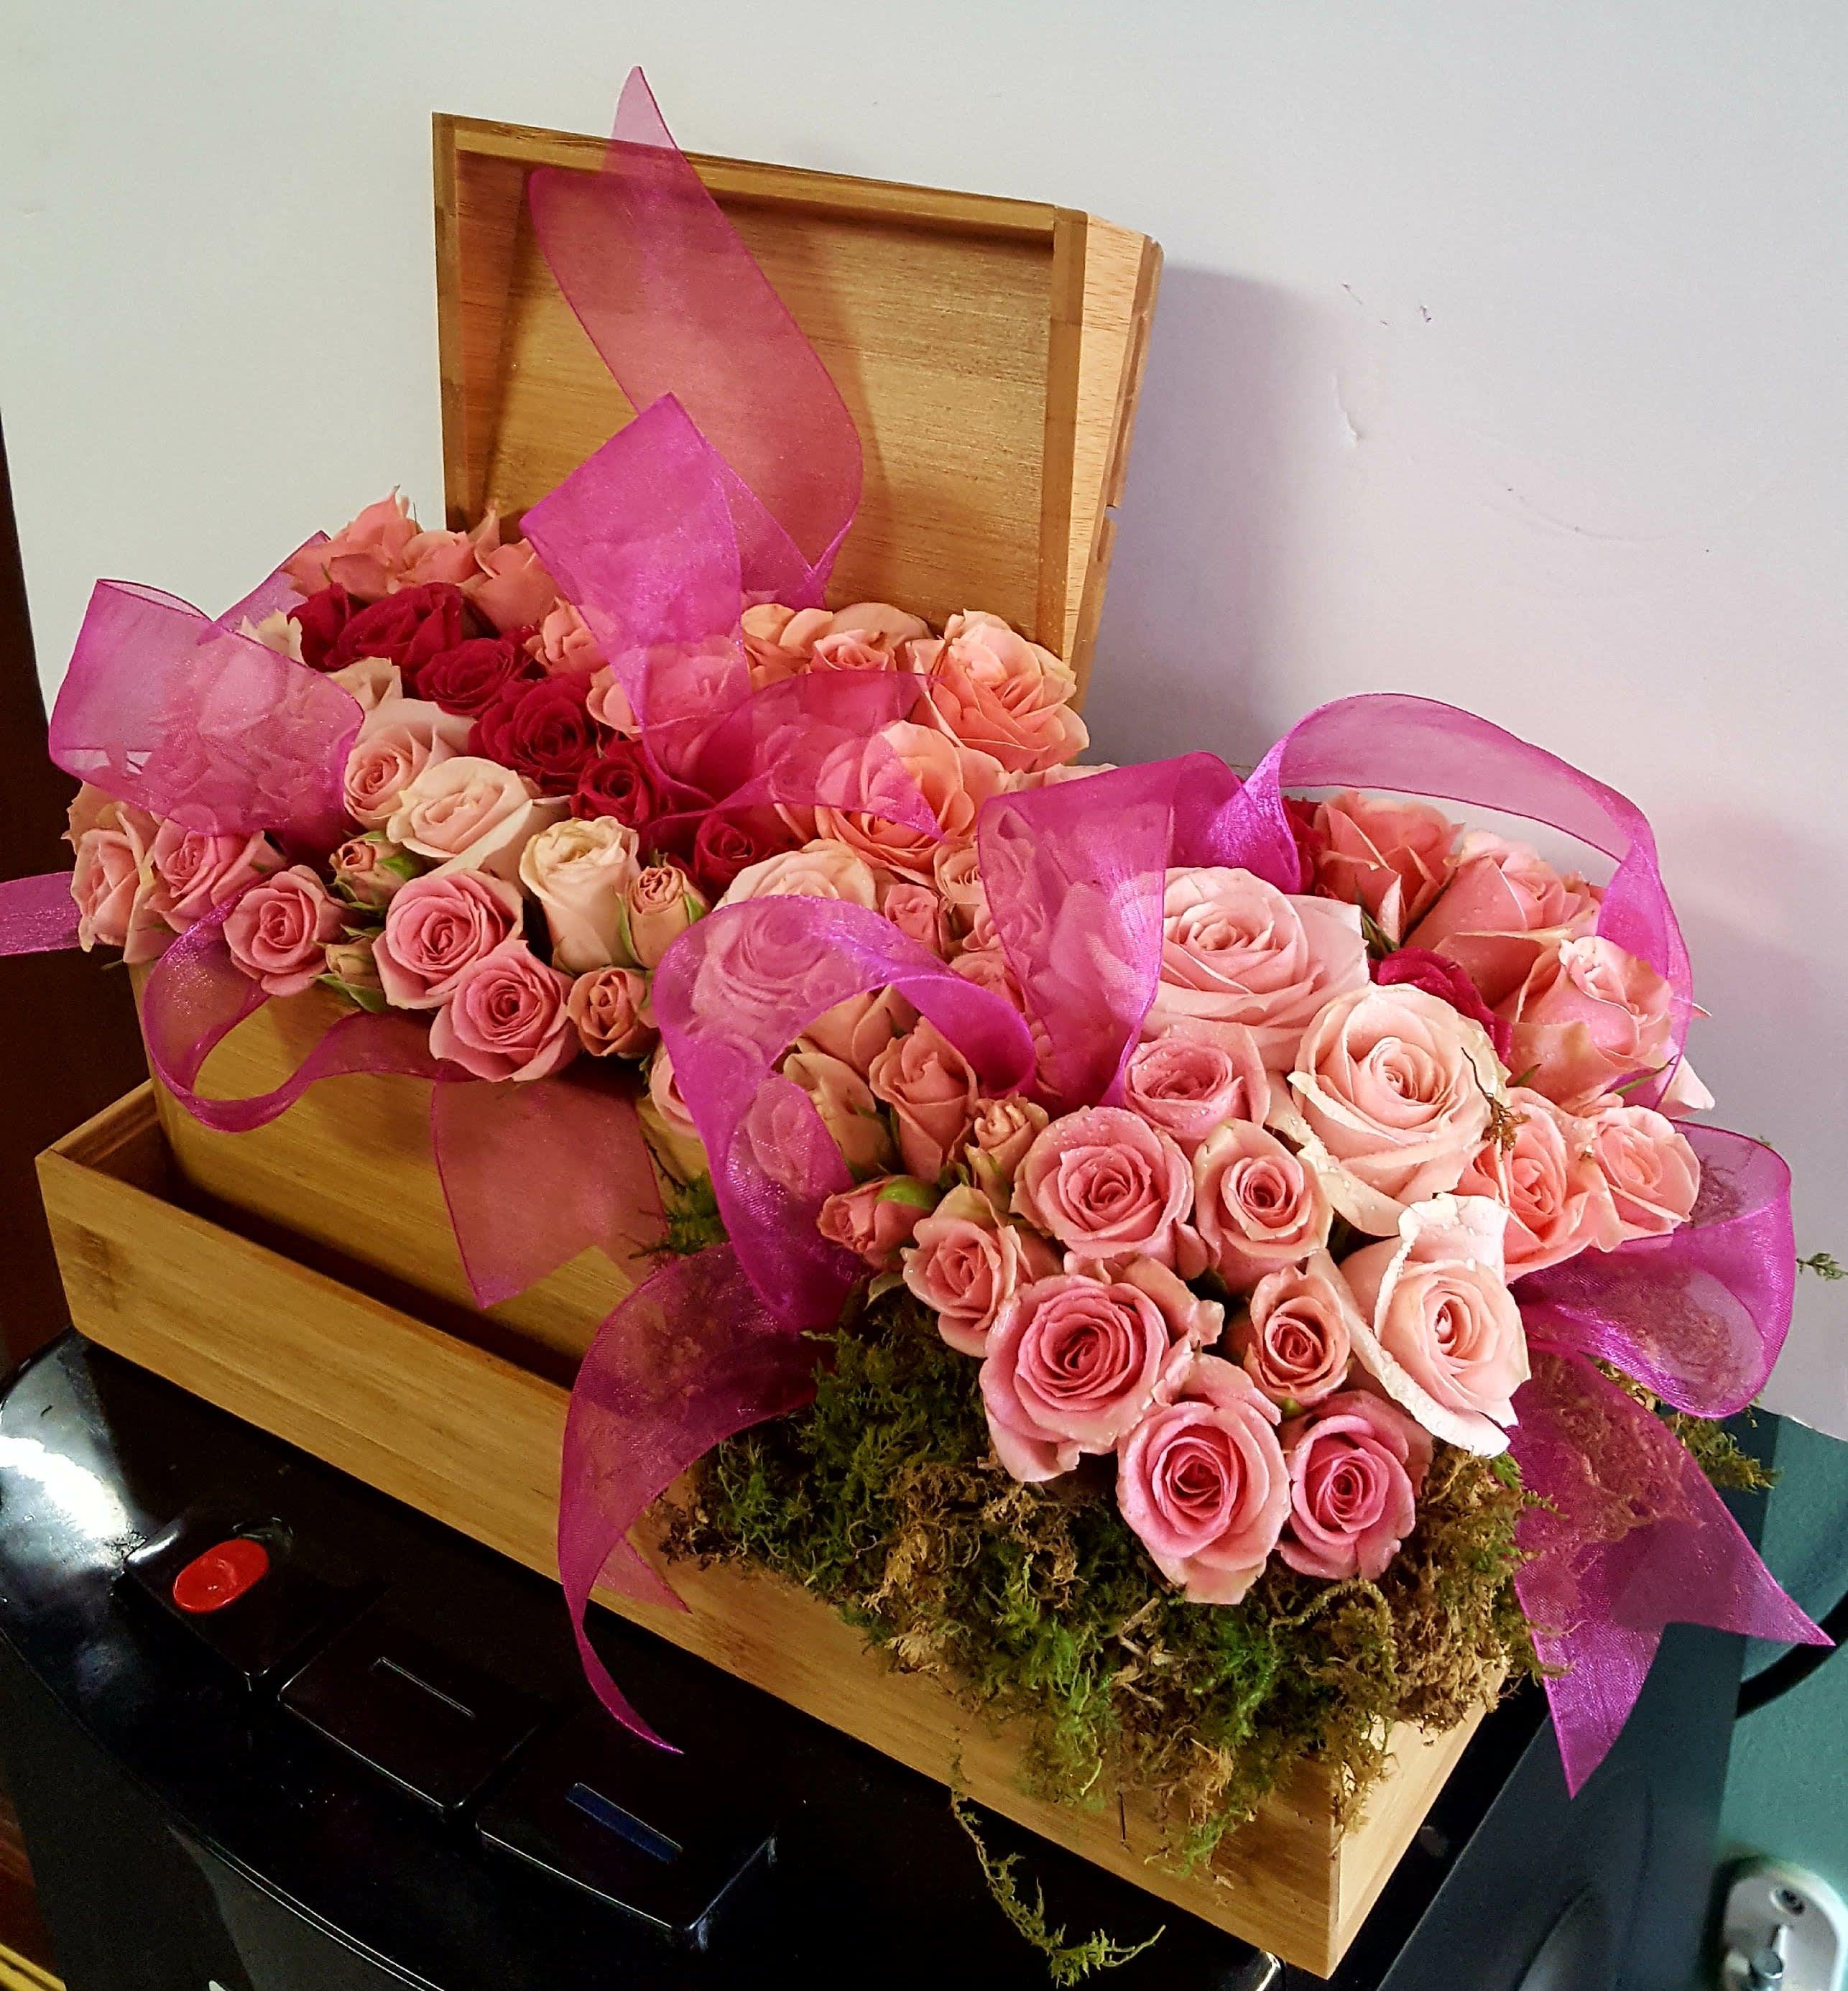 Blooms-In-Box in Phoenix, AZ | Arcadia Flowers & Gifts